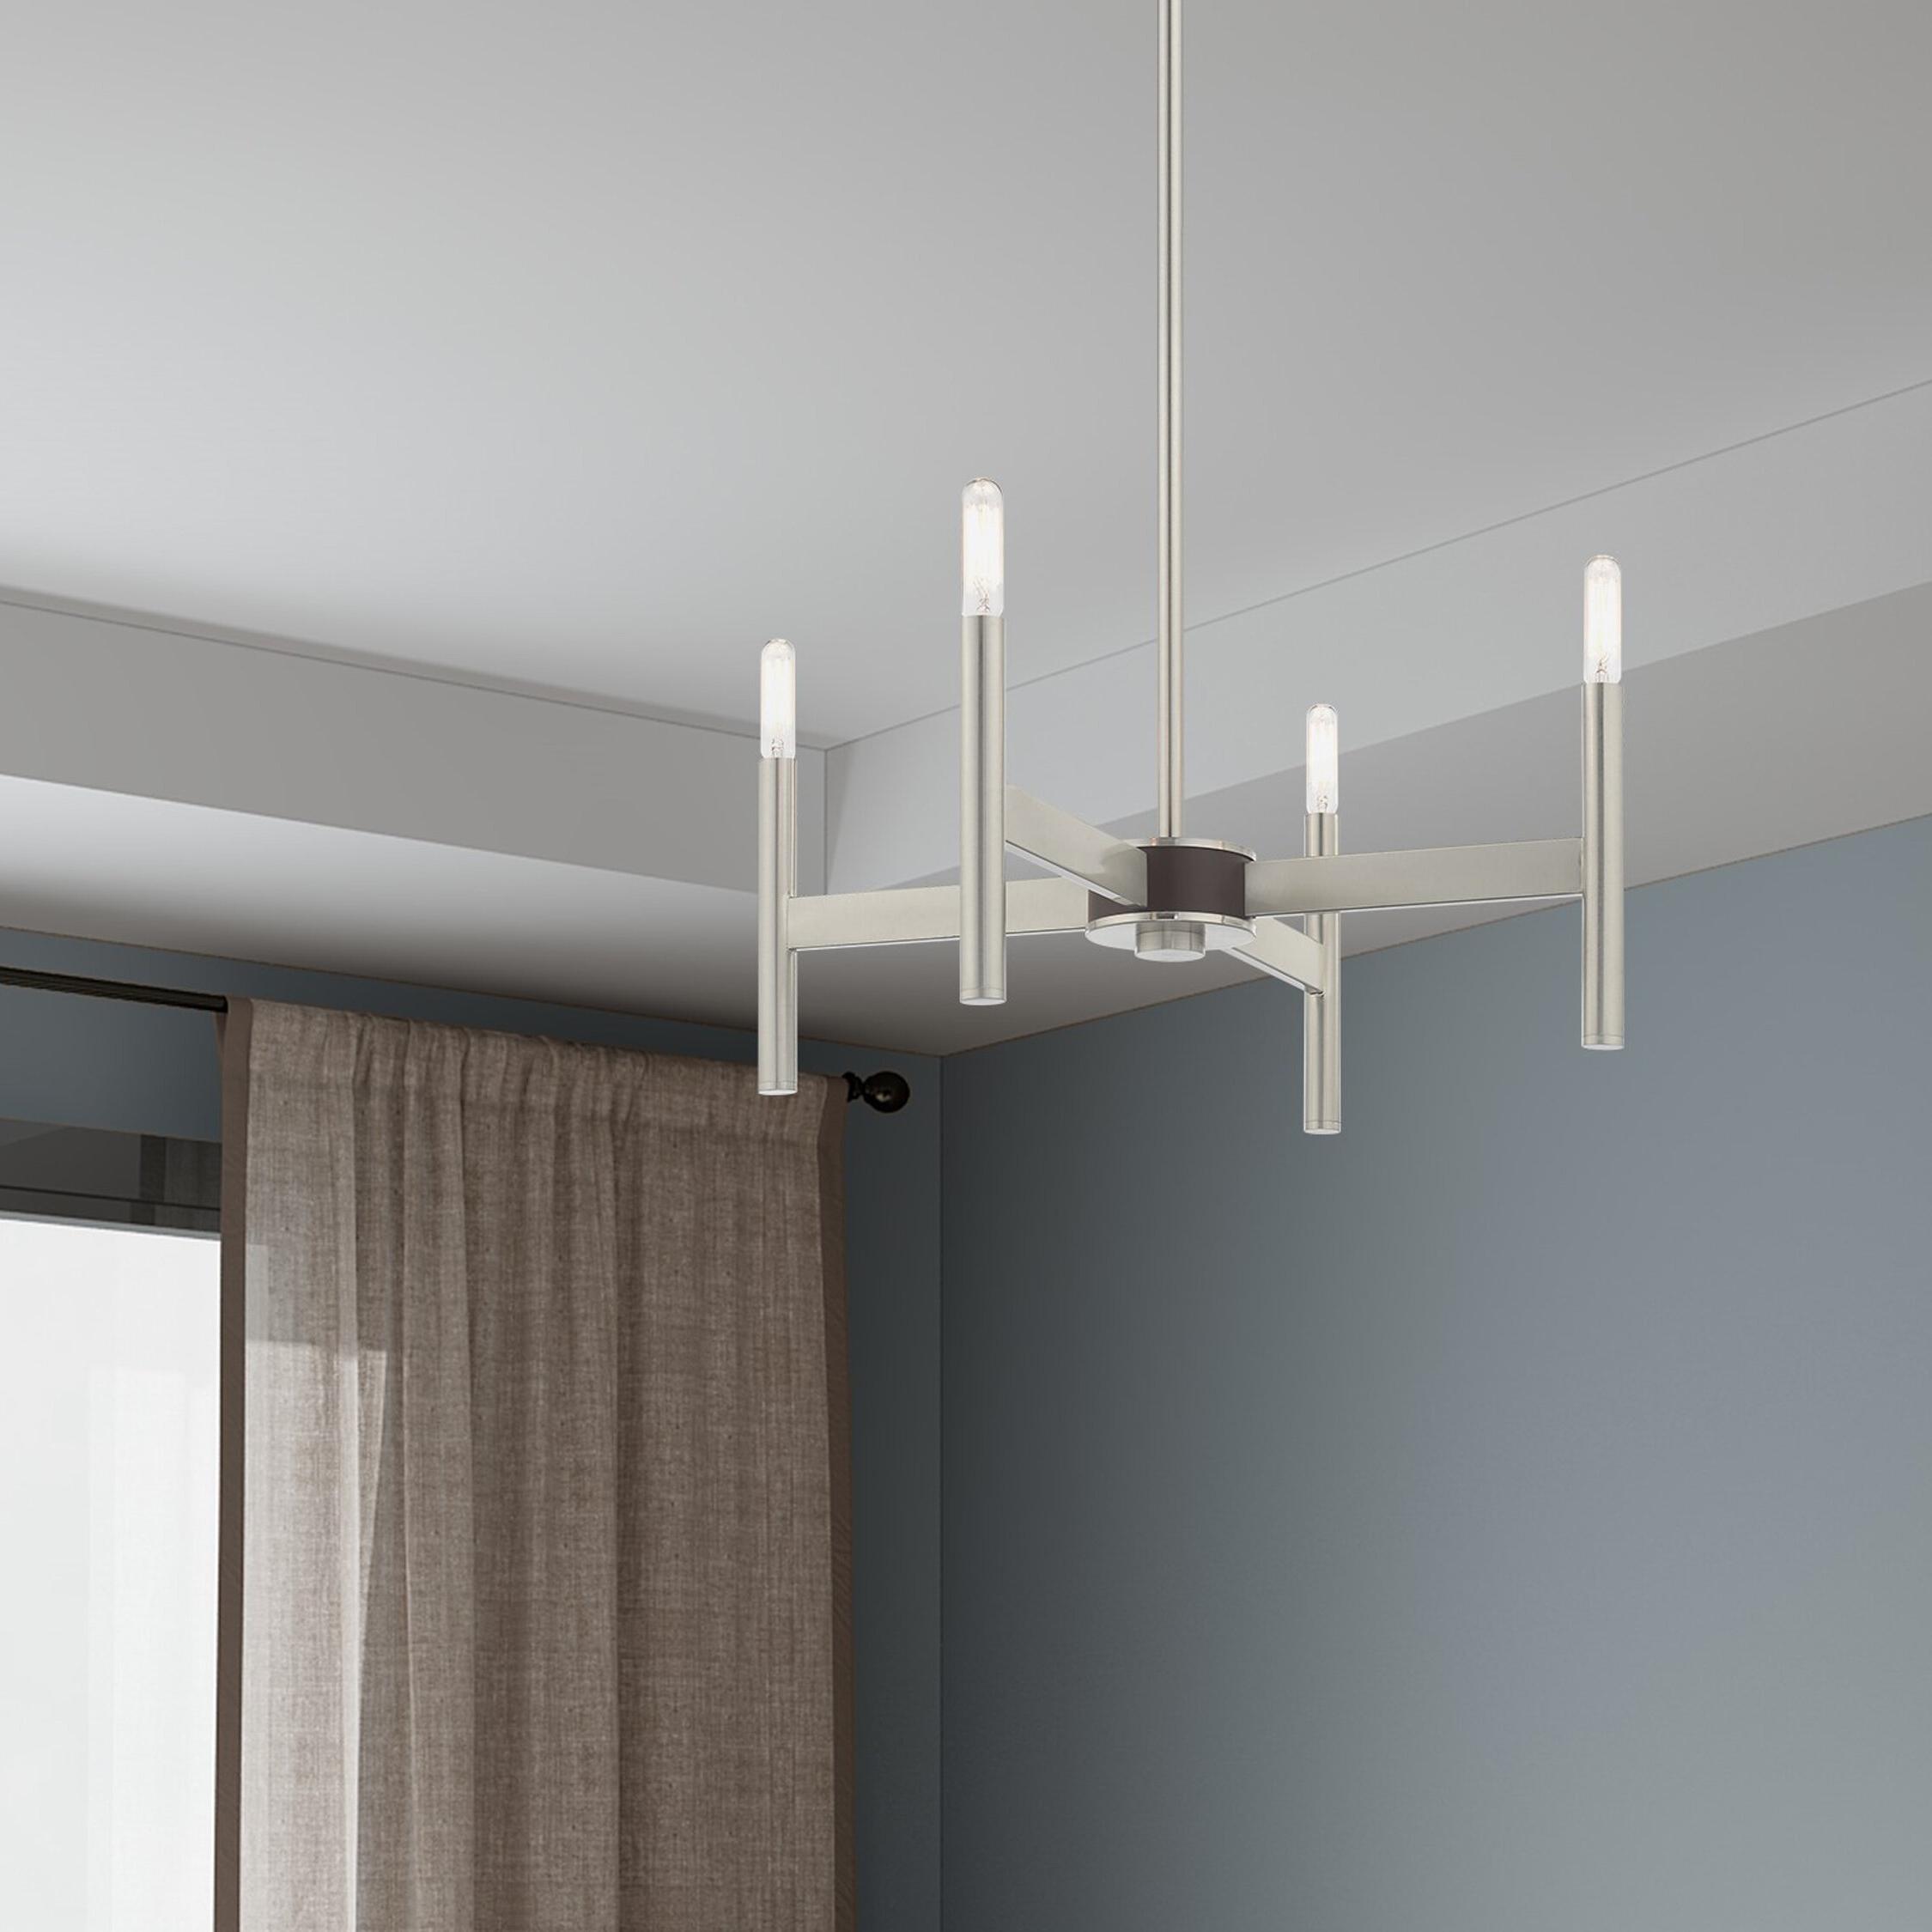 2019 Beldale Mini 4 Light Candle Style Chandelier Pertaining To Aldora 4 Light Candle Style Chandeliers (Gallery 19 of 20)